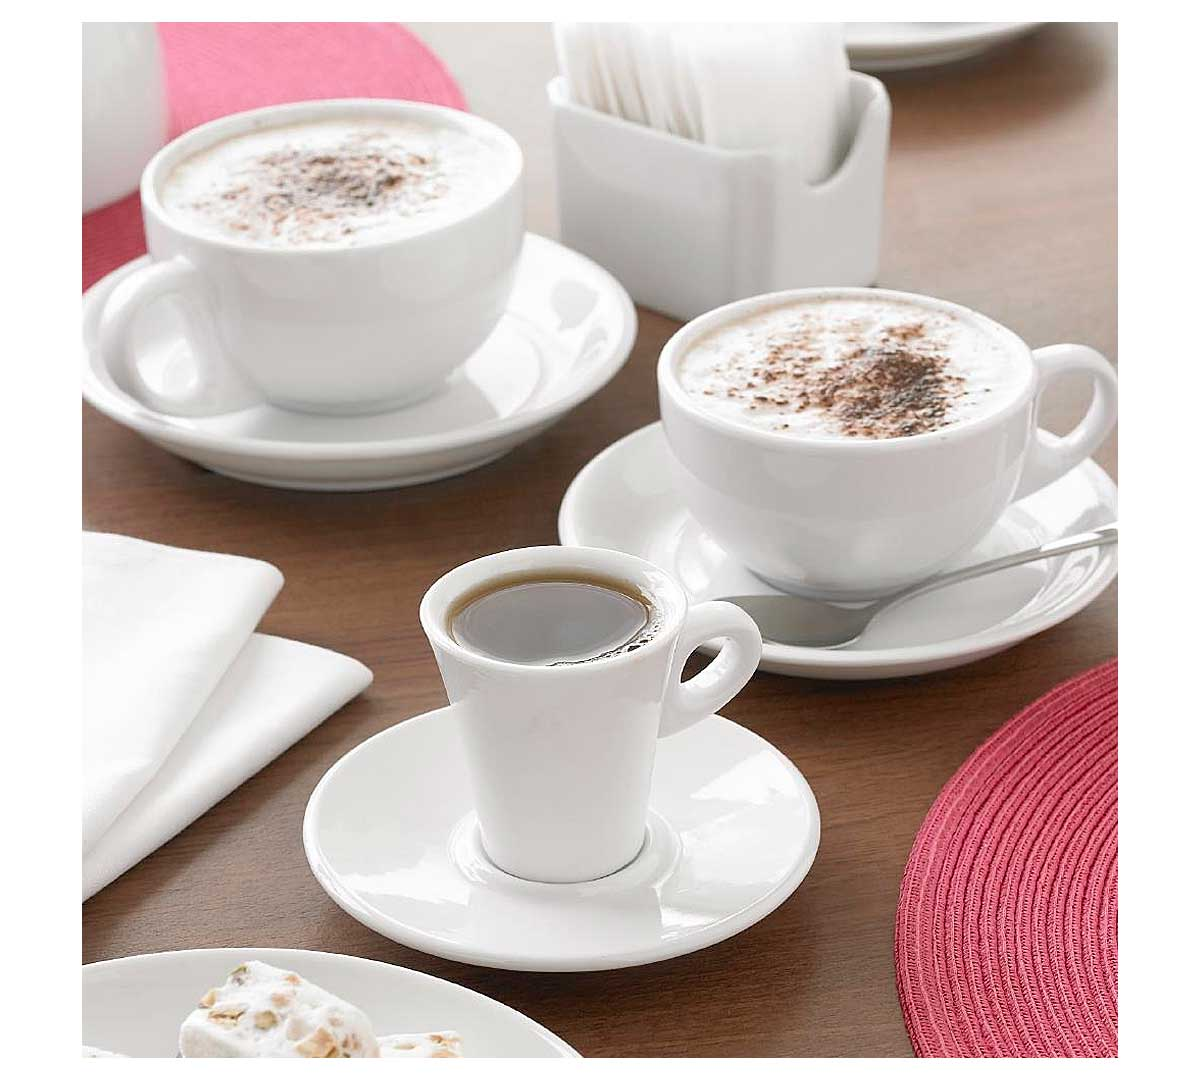 Serie porcelana blanca tazas de olympia for Tazas porcelana